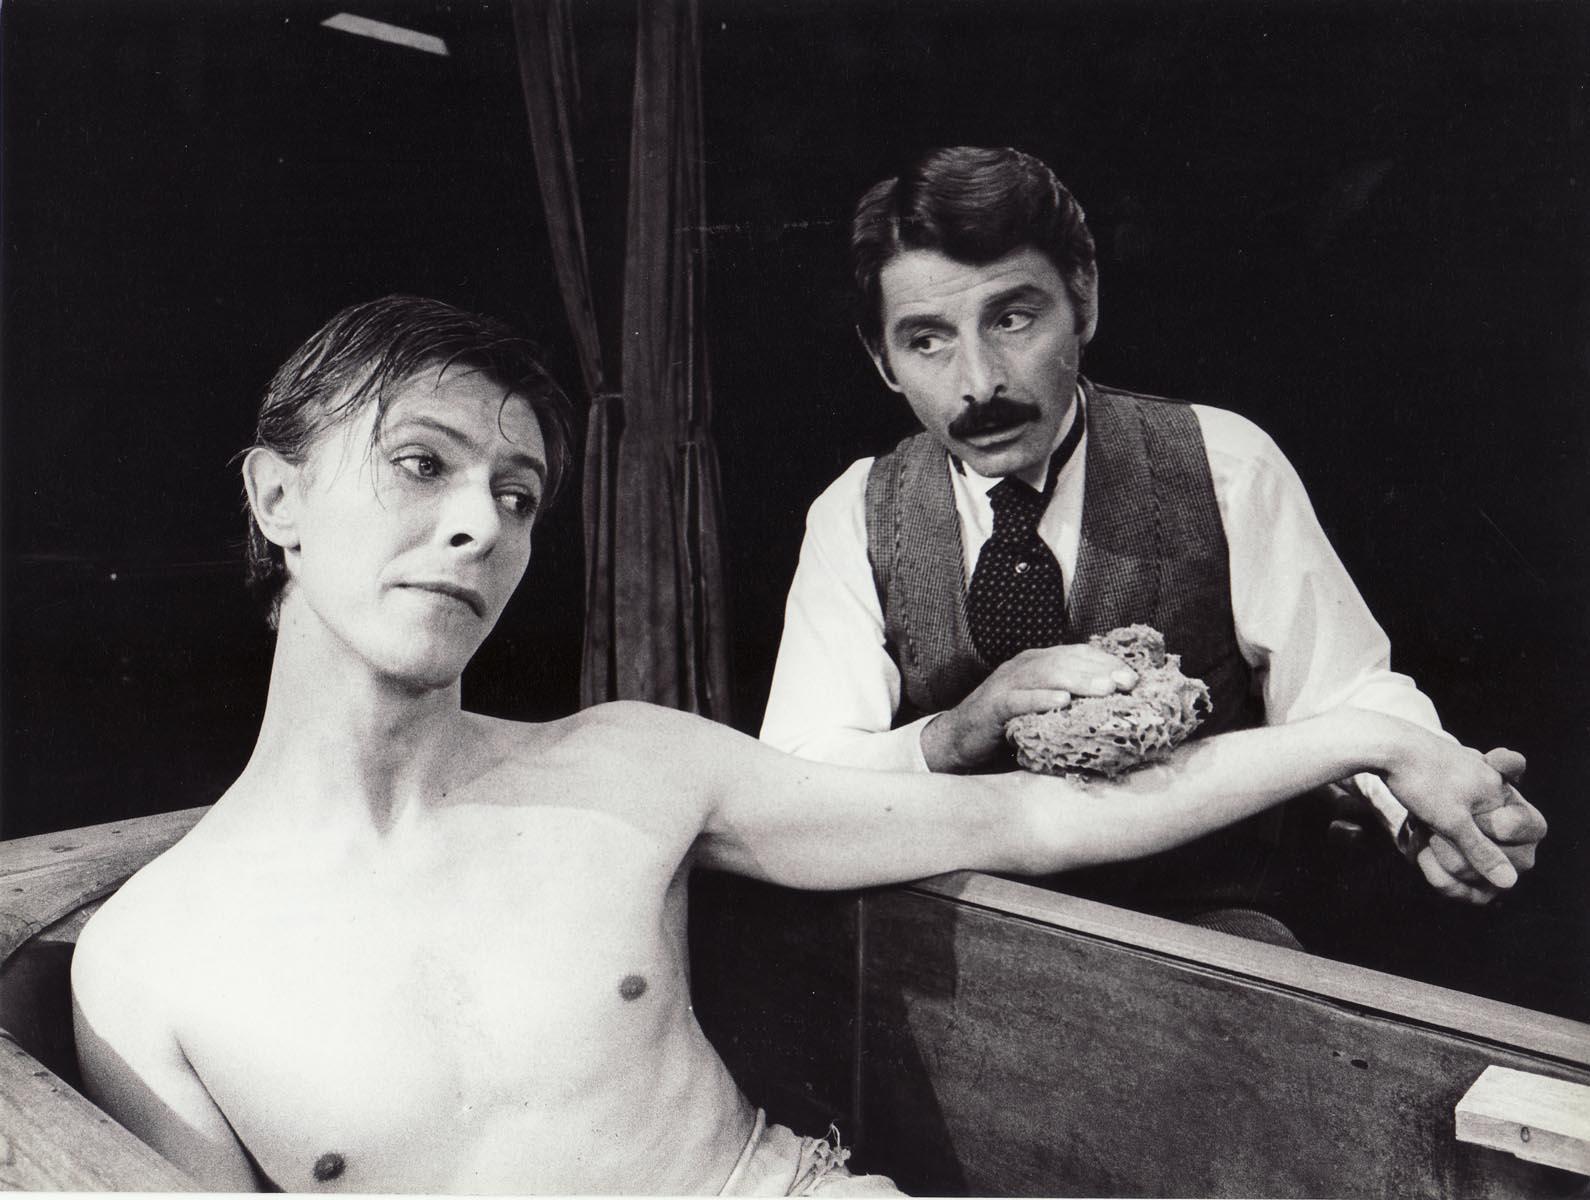 DAVID BOWIE ON STAGE / THE ELEPHANT MAN (1980) | WalterFilm